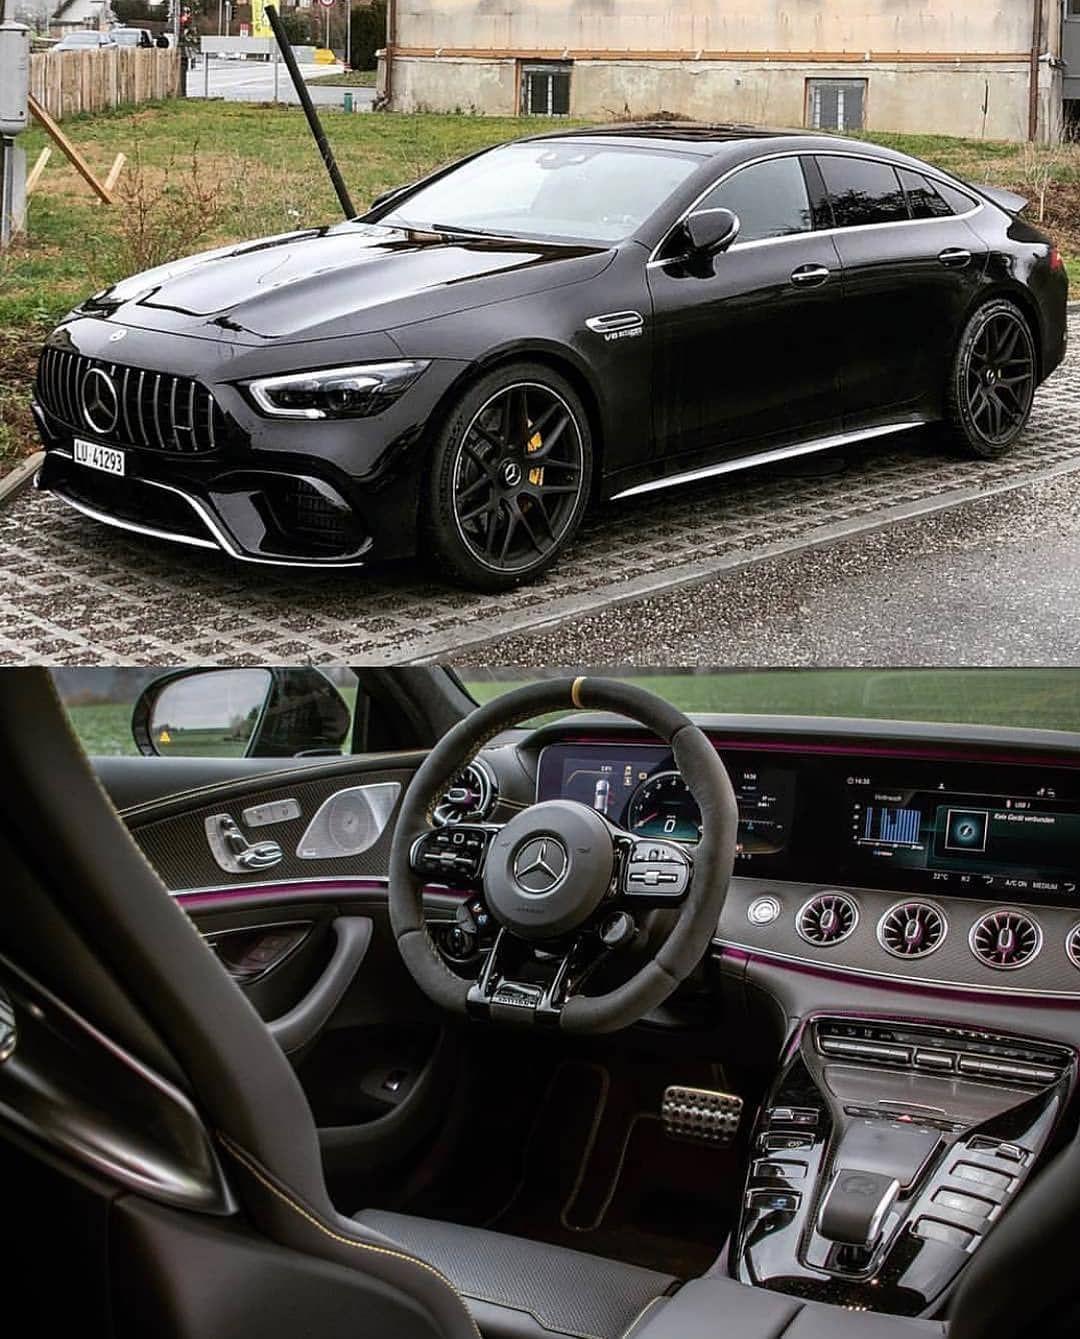 4 Door Sports Cars, Mercedes Benz